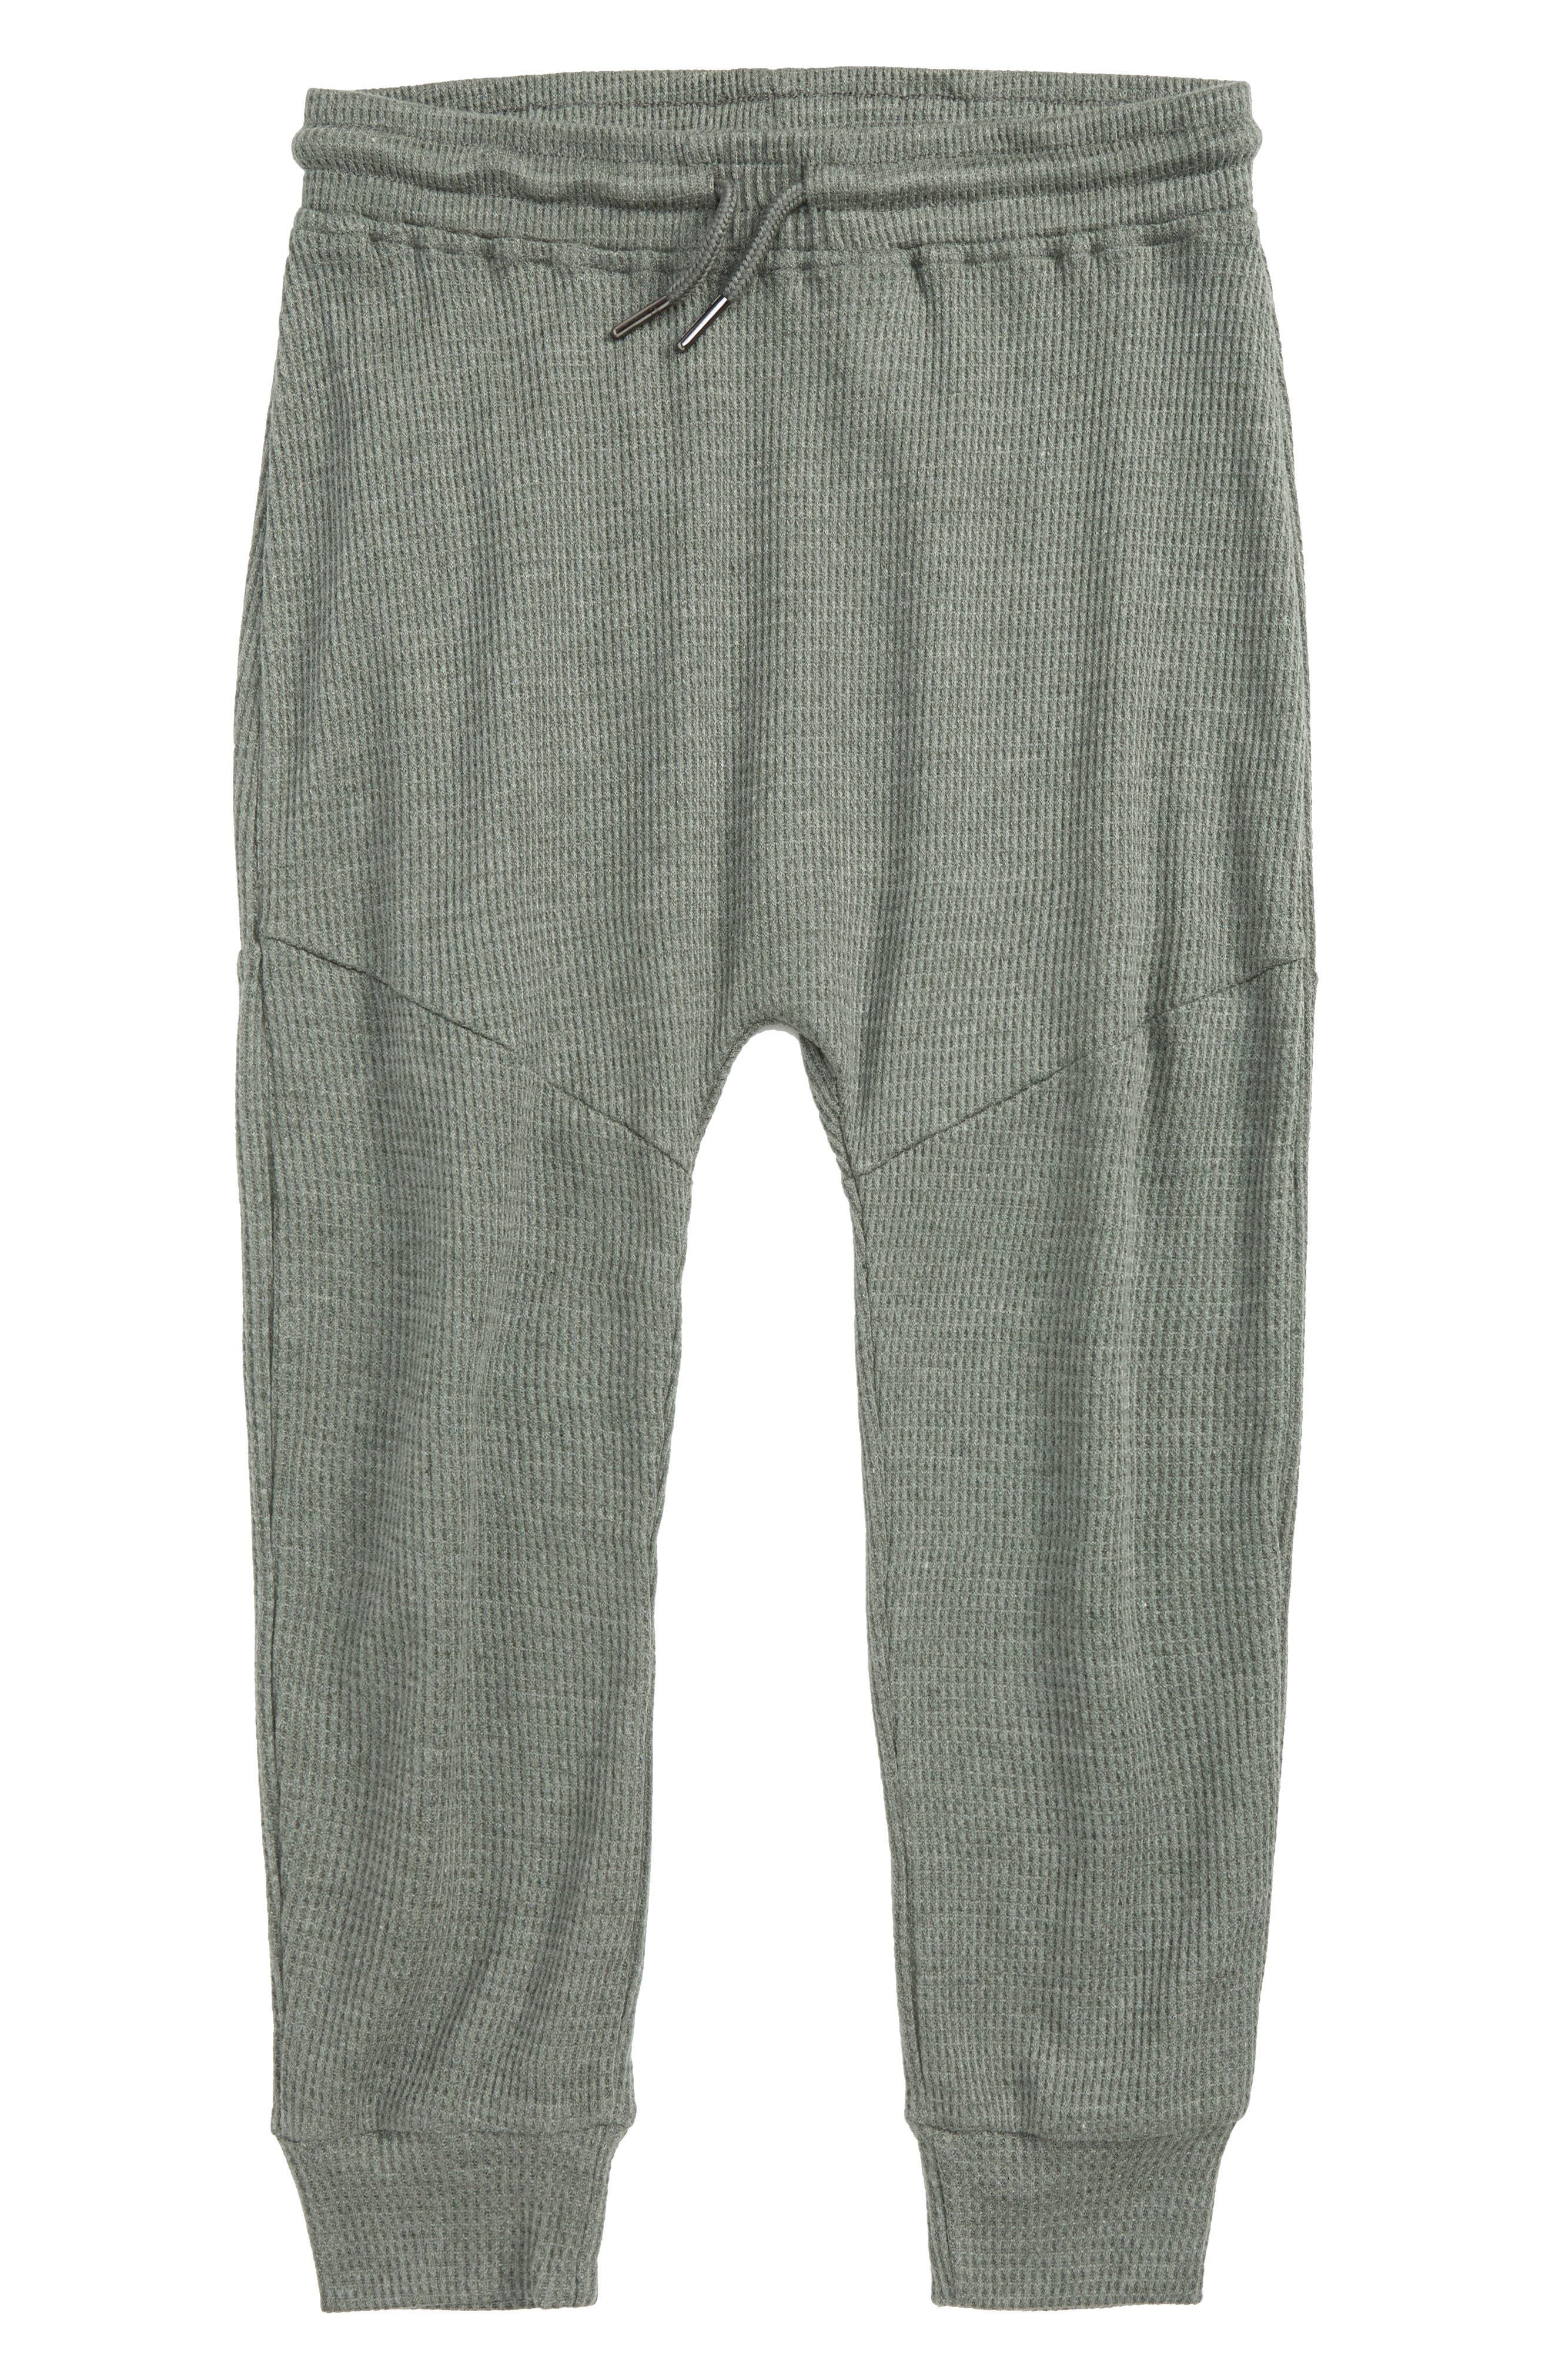 Alternate Image 1 Selected - Superism Jude Thermal Knit Jogger Pants (Big Boys)